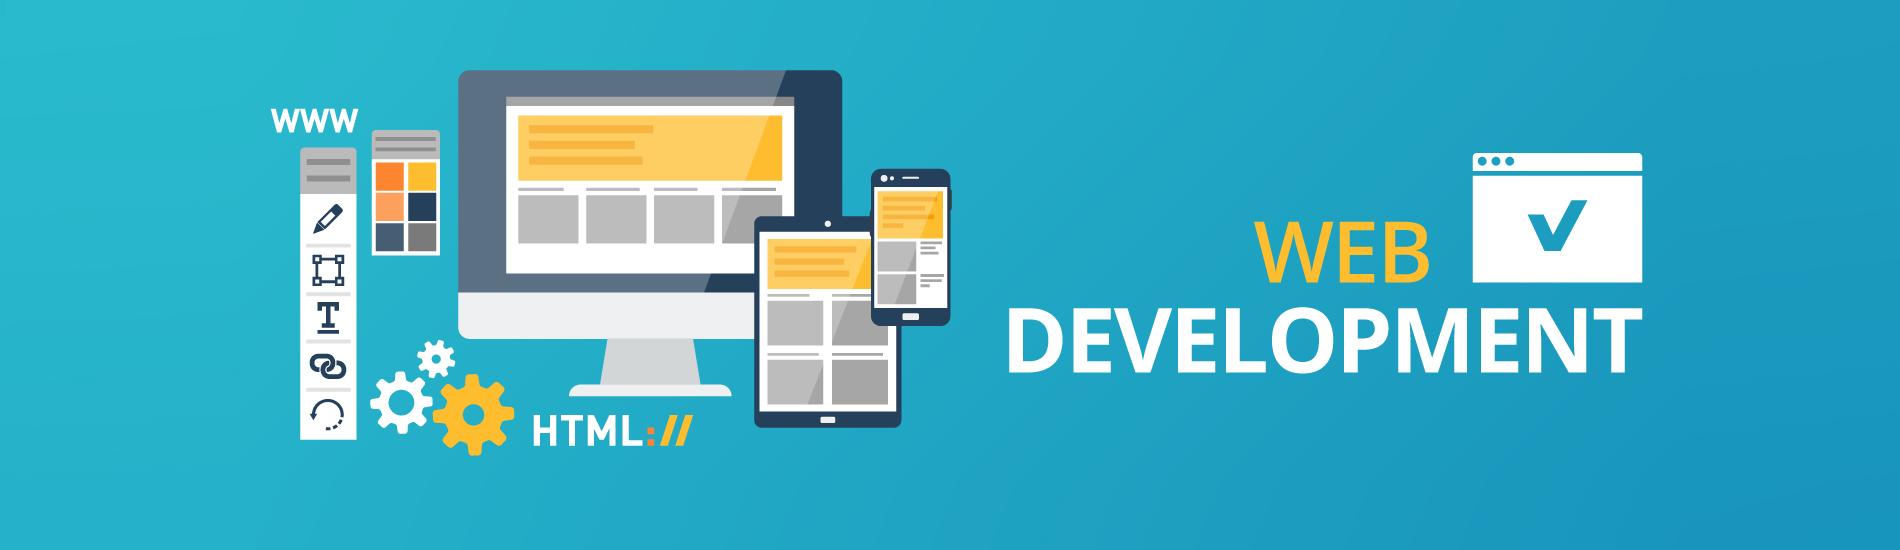 web-development-application